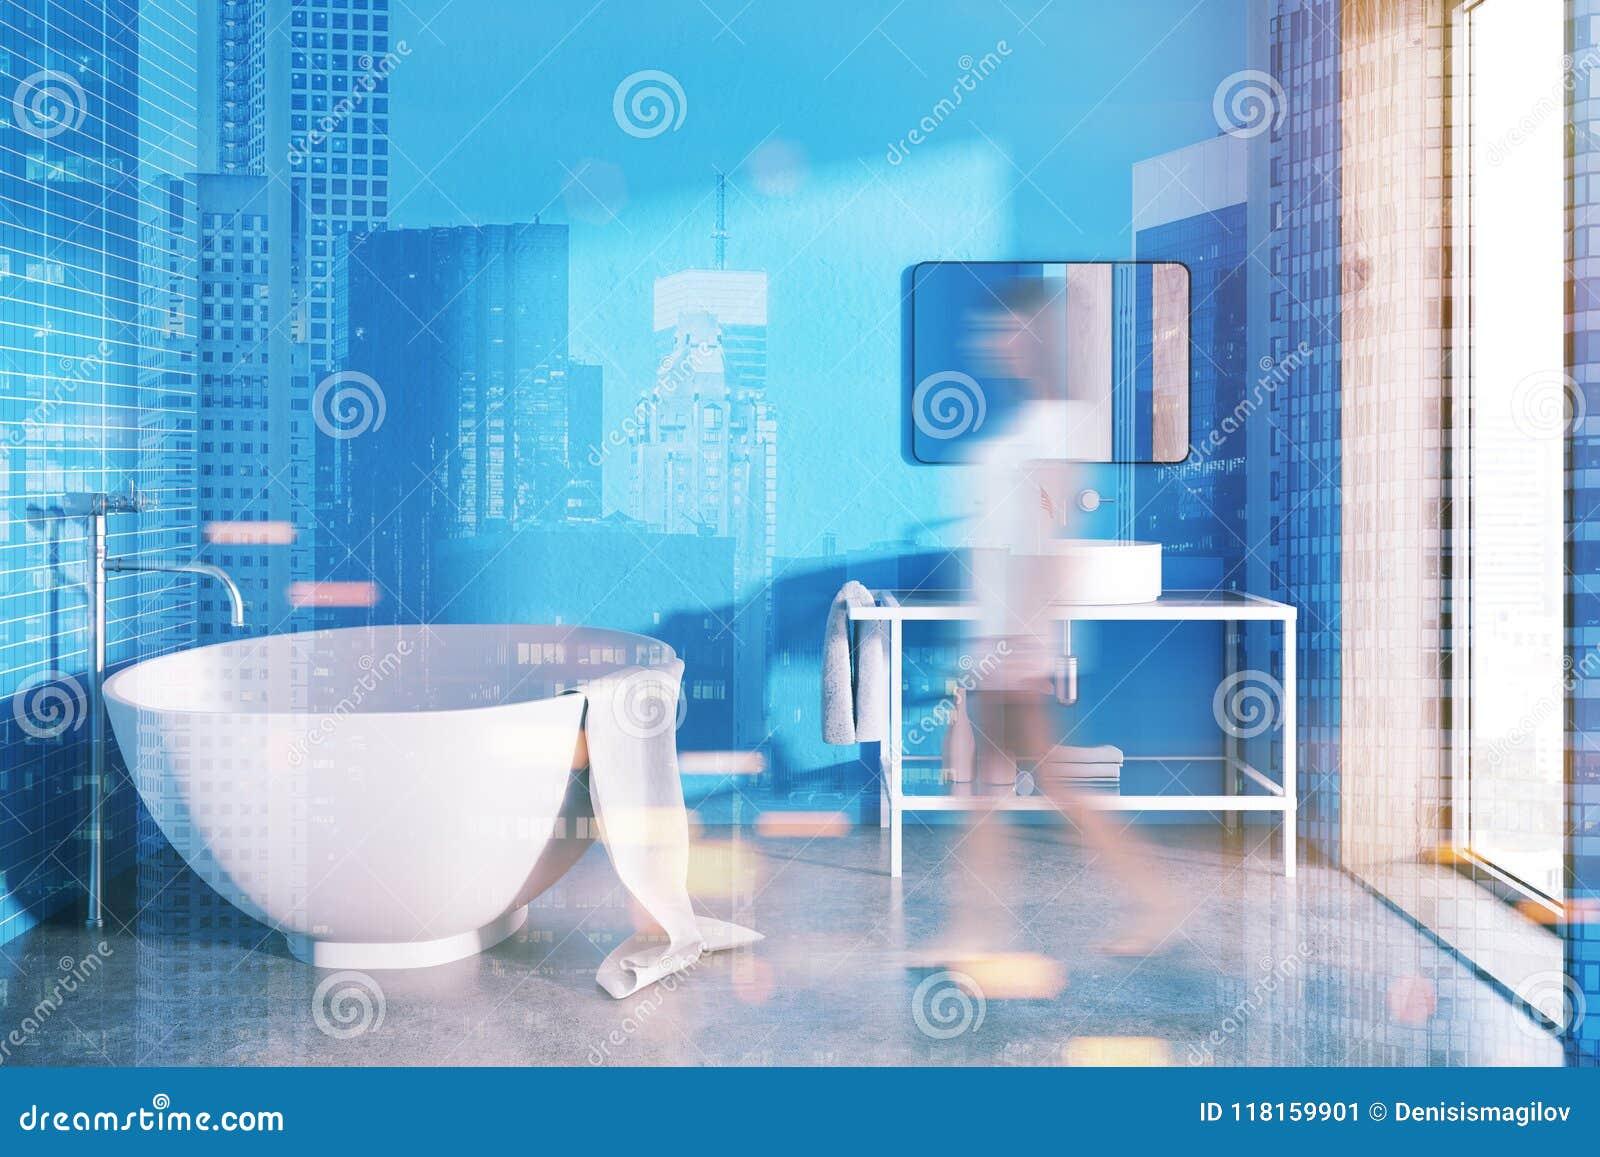 Round Bathtub Blue Bathroom Interior Toned Stock Image - Image of ...